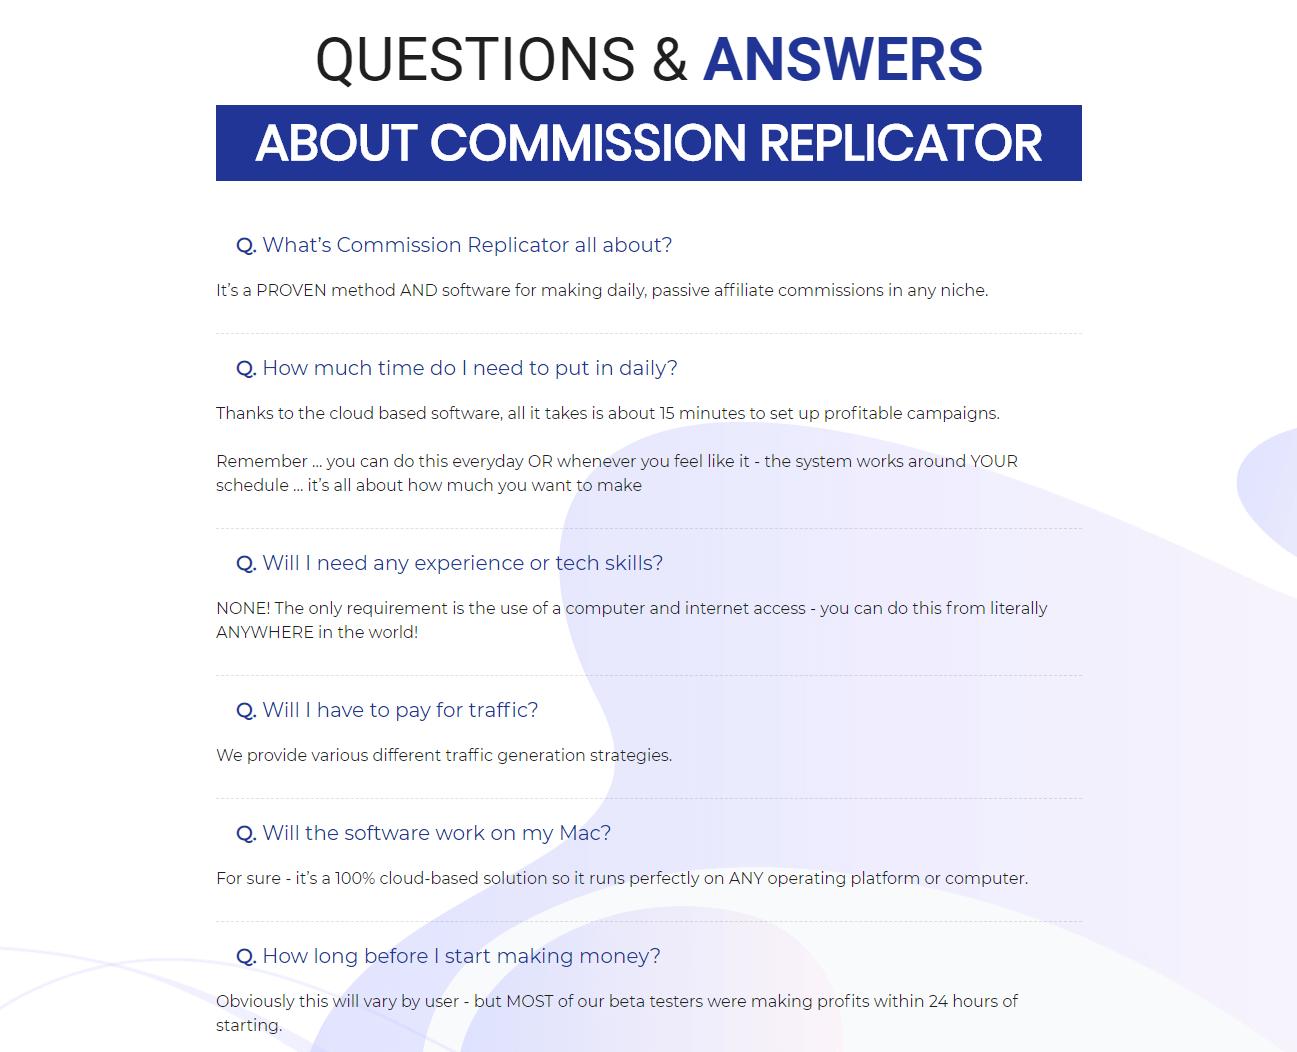 Commission-Replicator-Review-QA